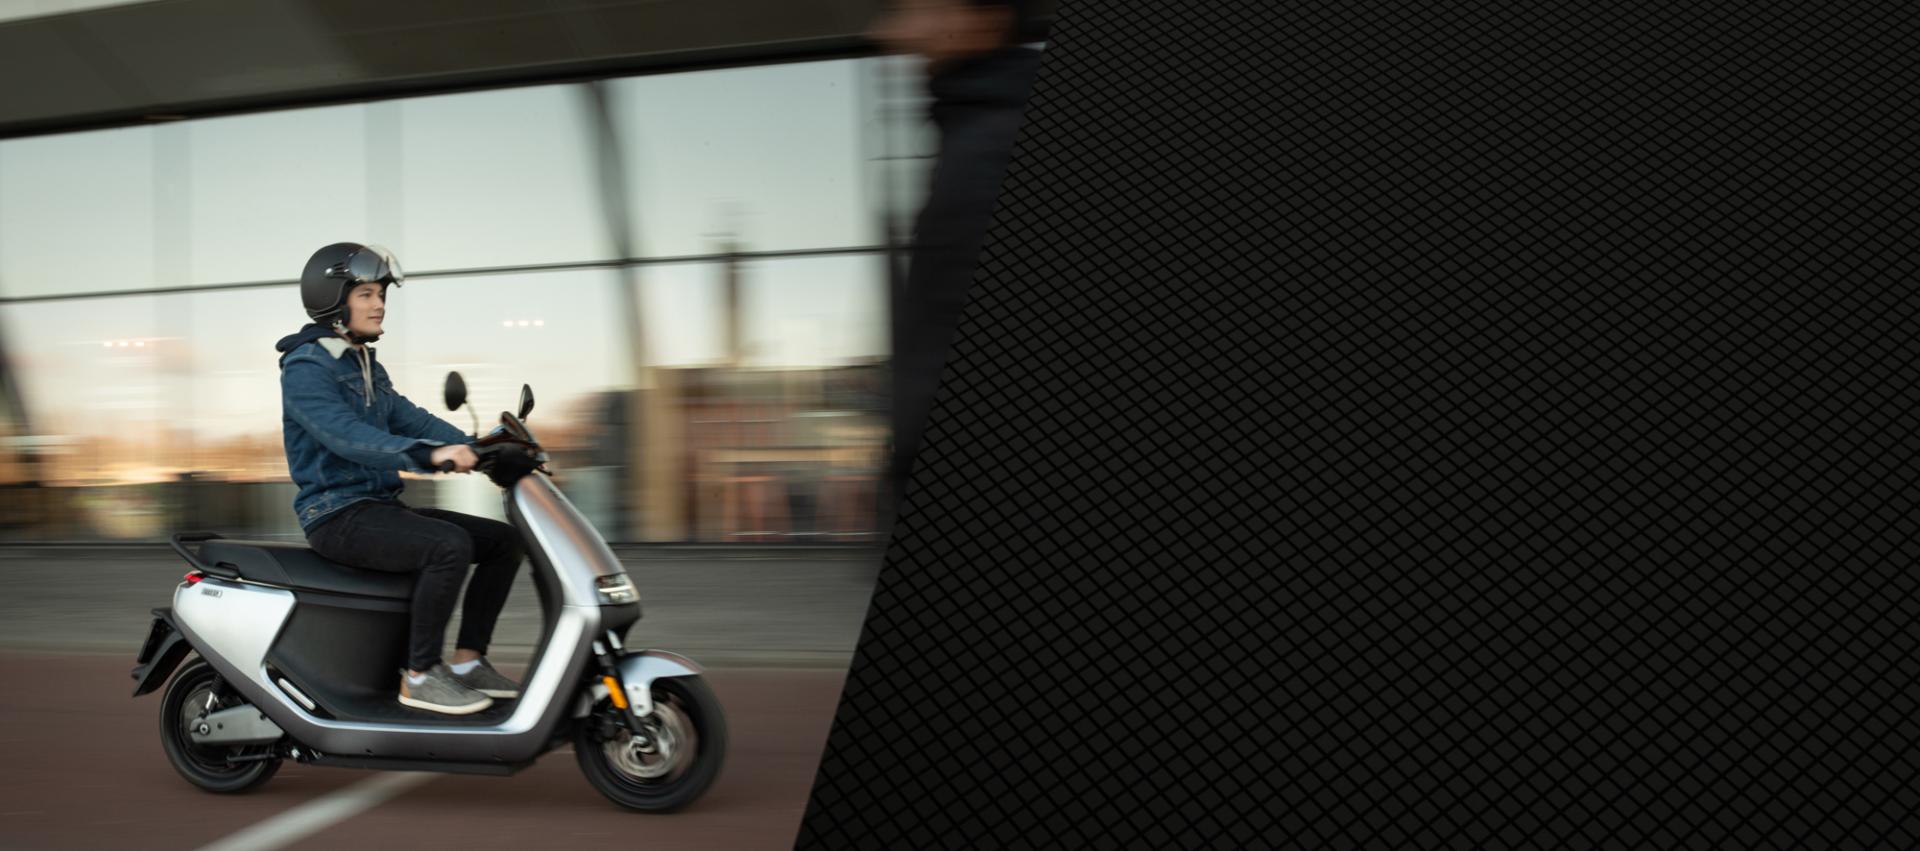 Introducing, the RideyGo! Intelligent System